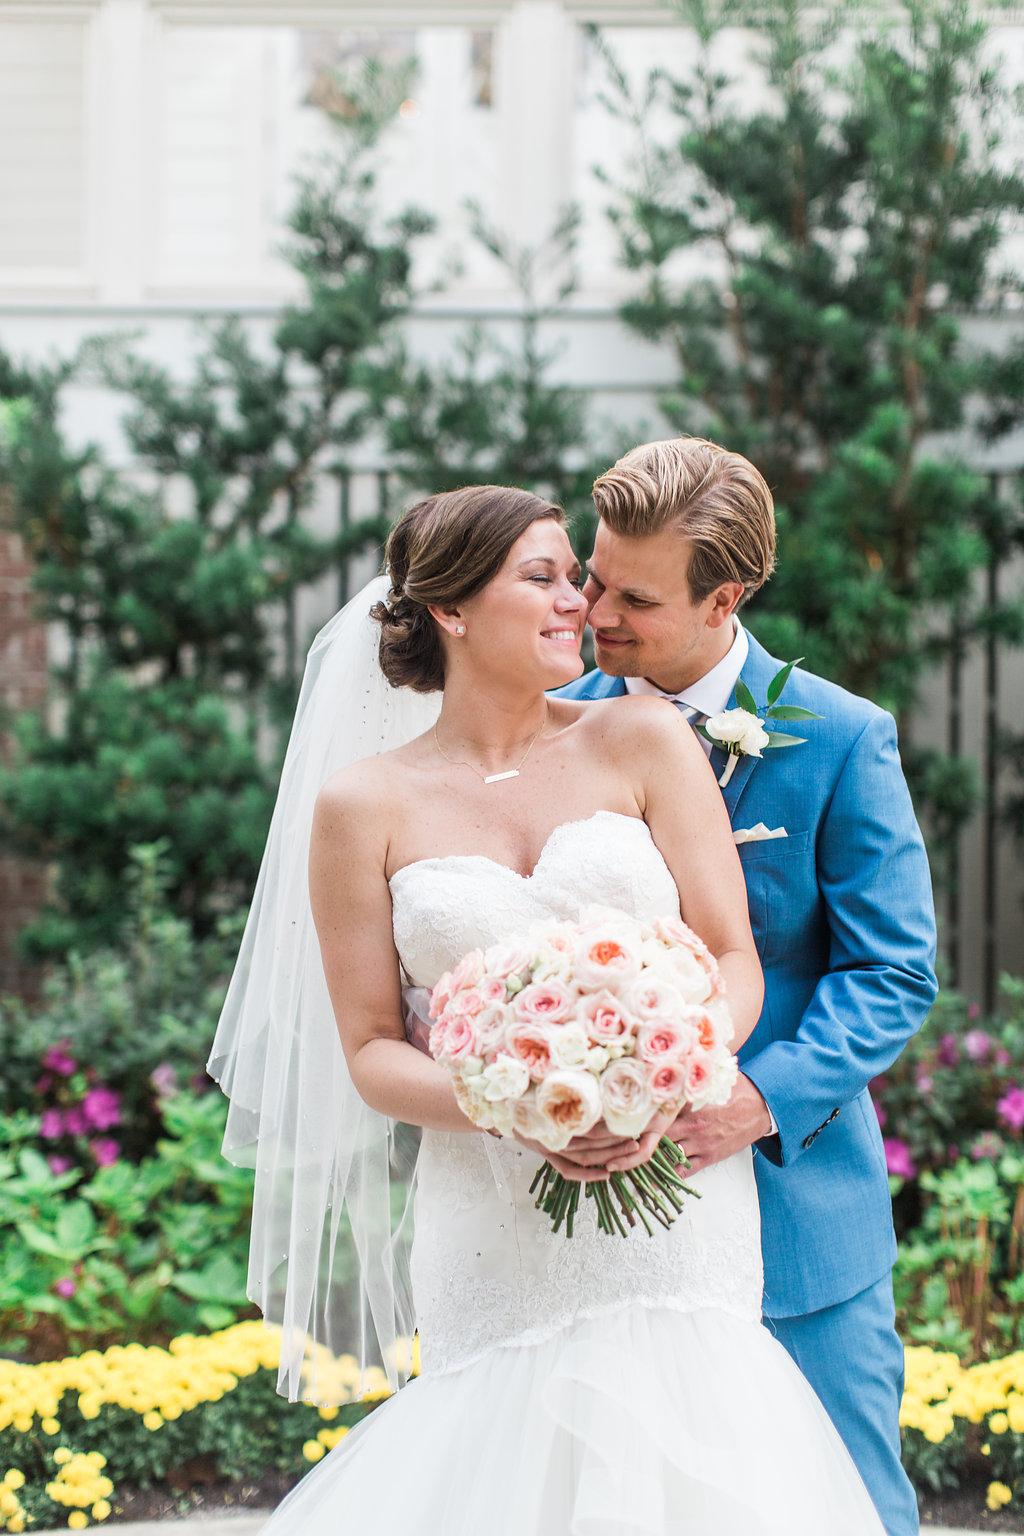 apt-b-photography-ivory-and-beau-bridal-boutique-savannah-florist-savannah-wedding-flowers-savannah-wedding-planner-tybee-island-wedding-chapel-wedding-rose-bouquet-blush-wedding-tybee-wedding-savannah-weddings-savannah-flowers-26.jpg